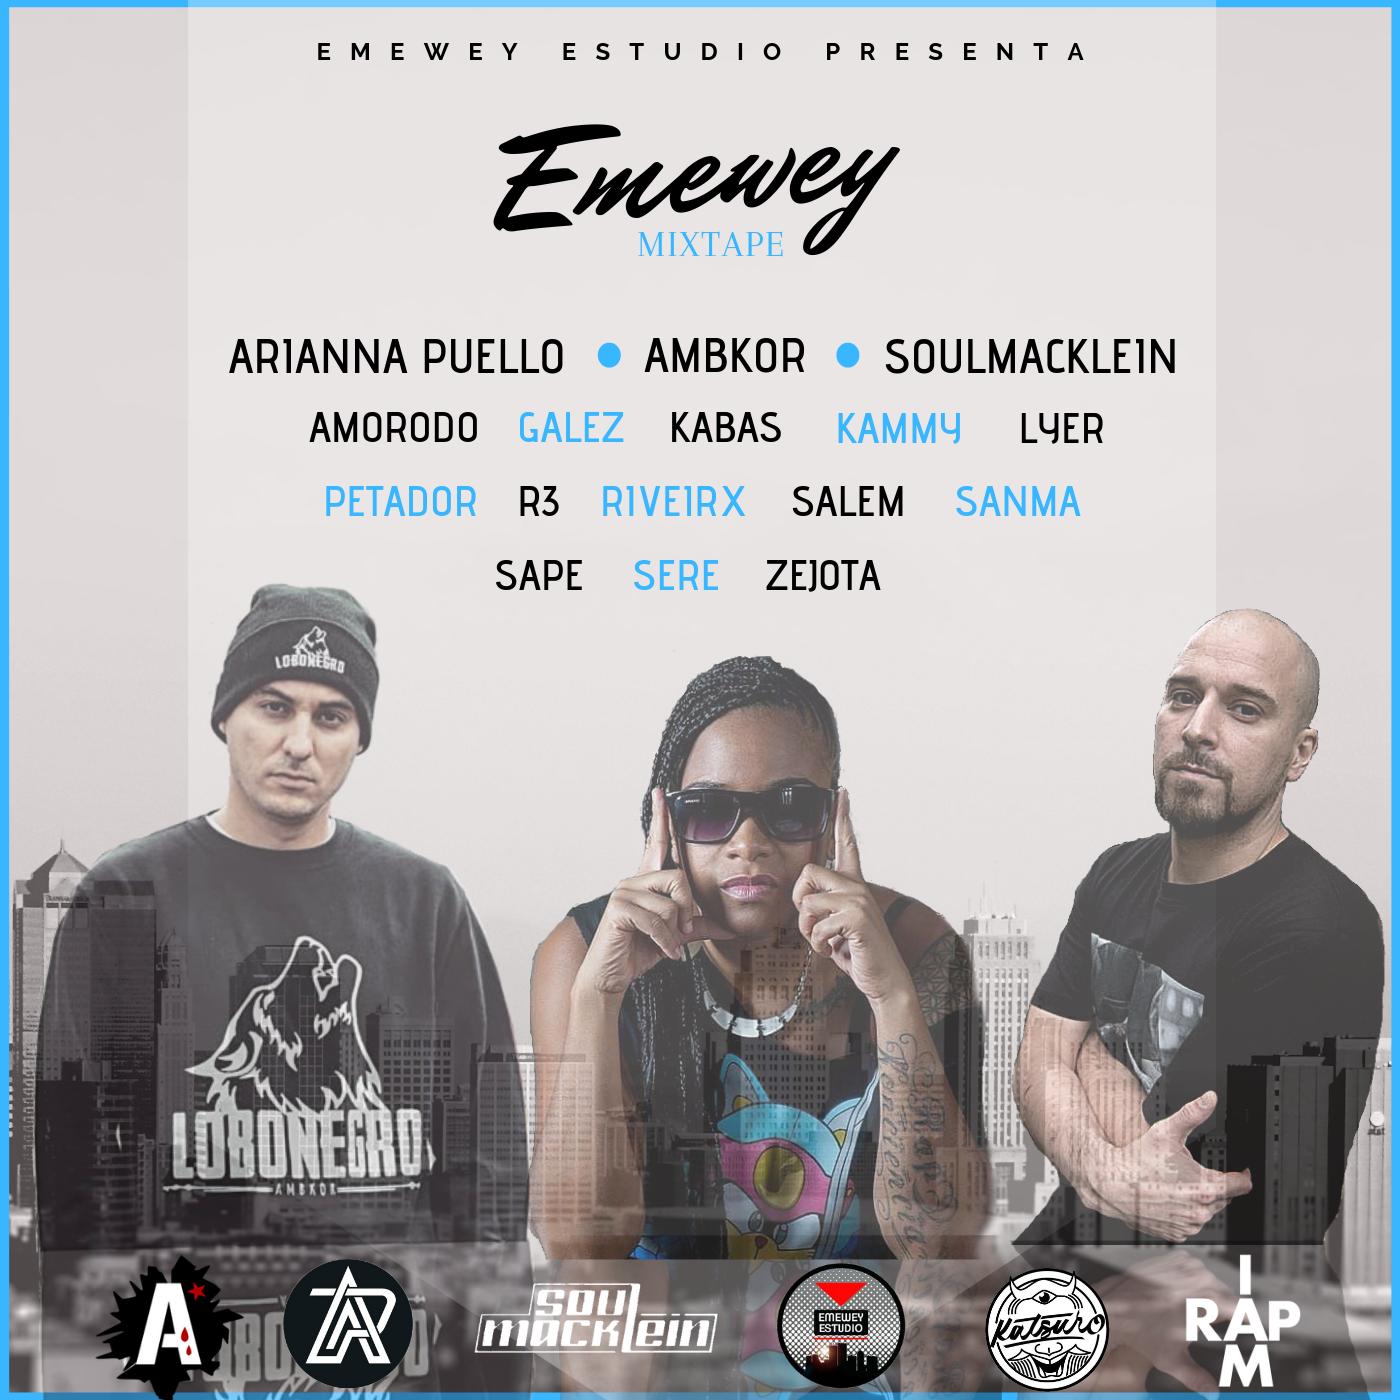 Por fin podéis descargar la mixtape de Emewey Estudio